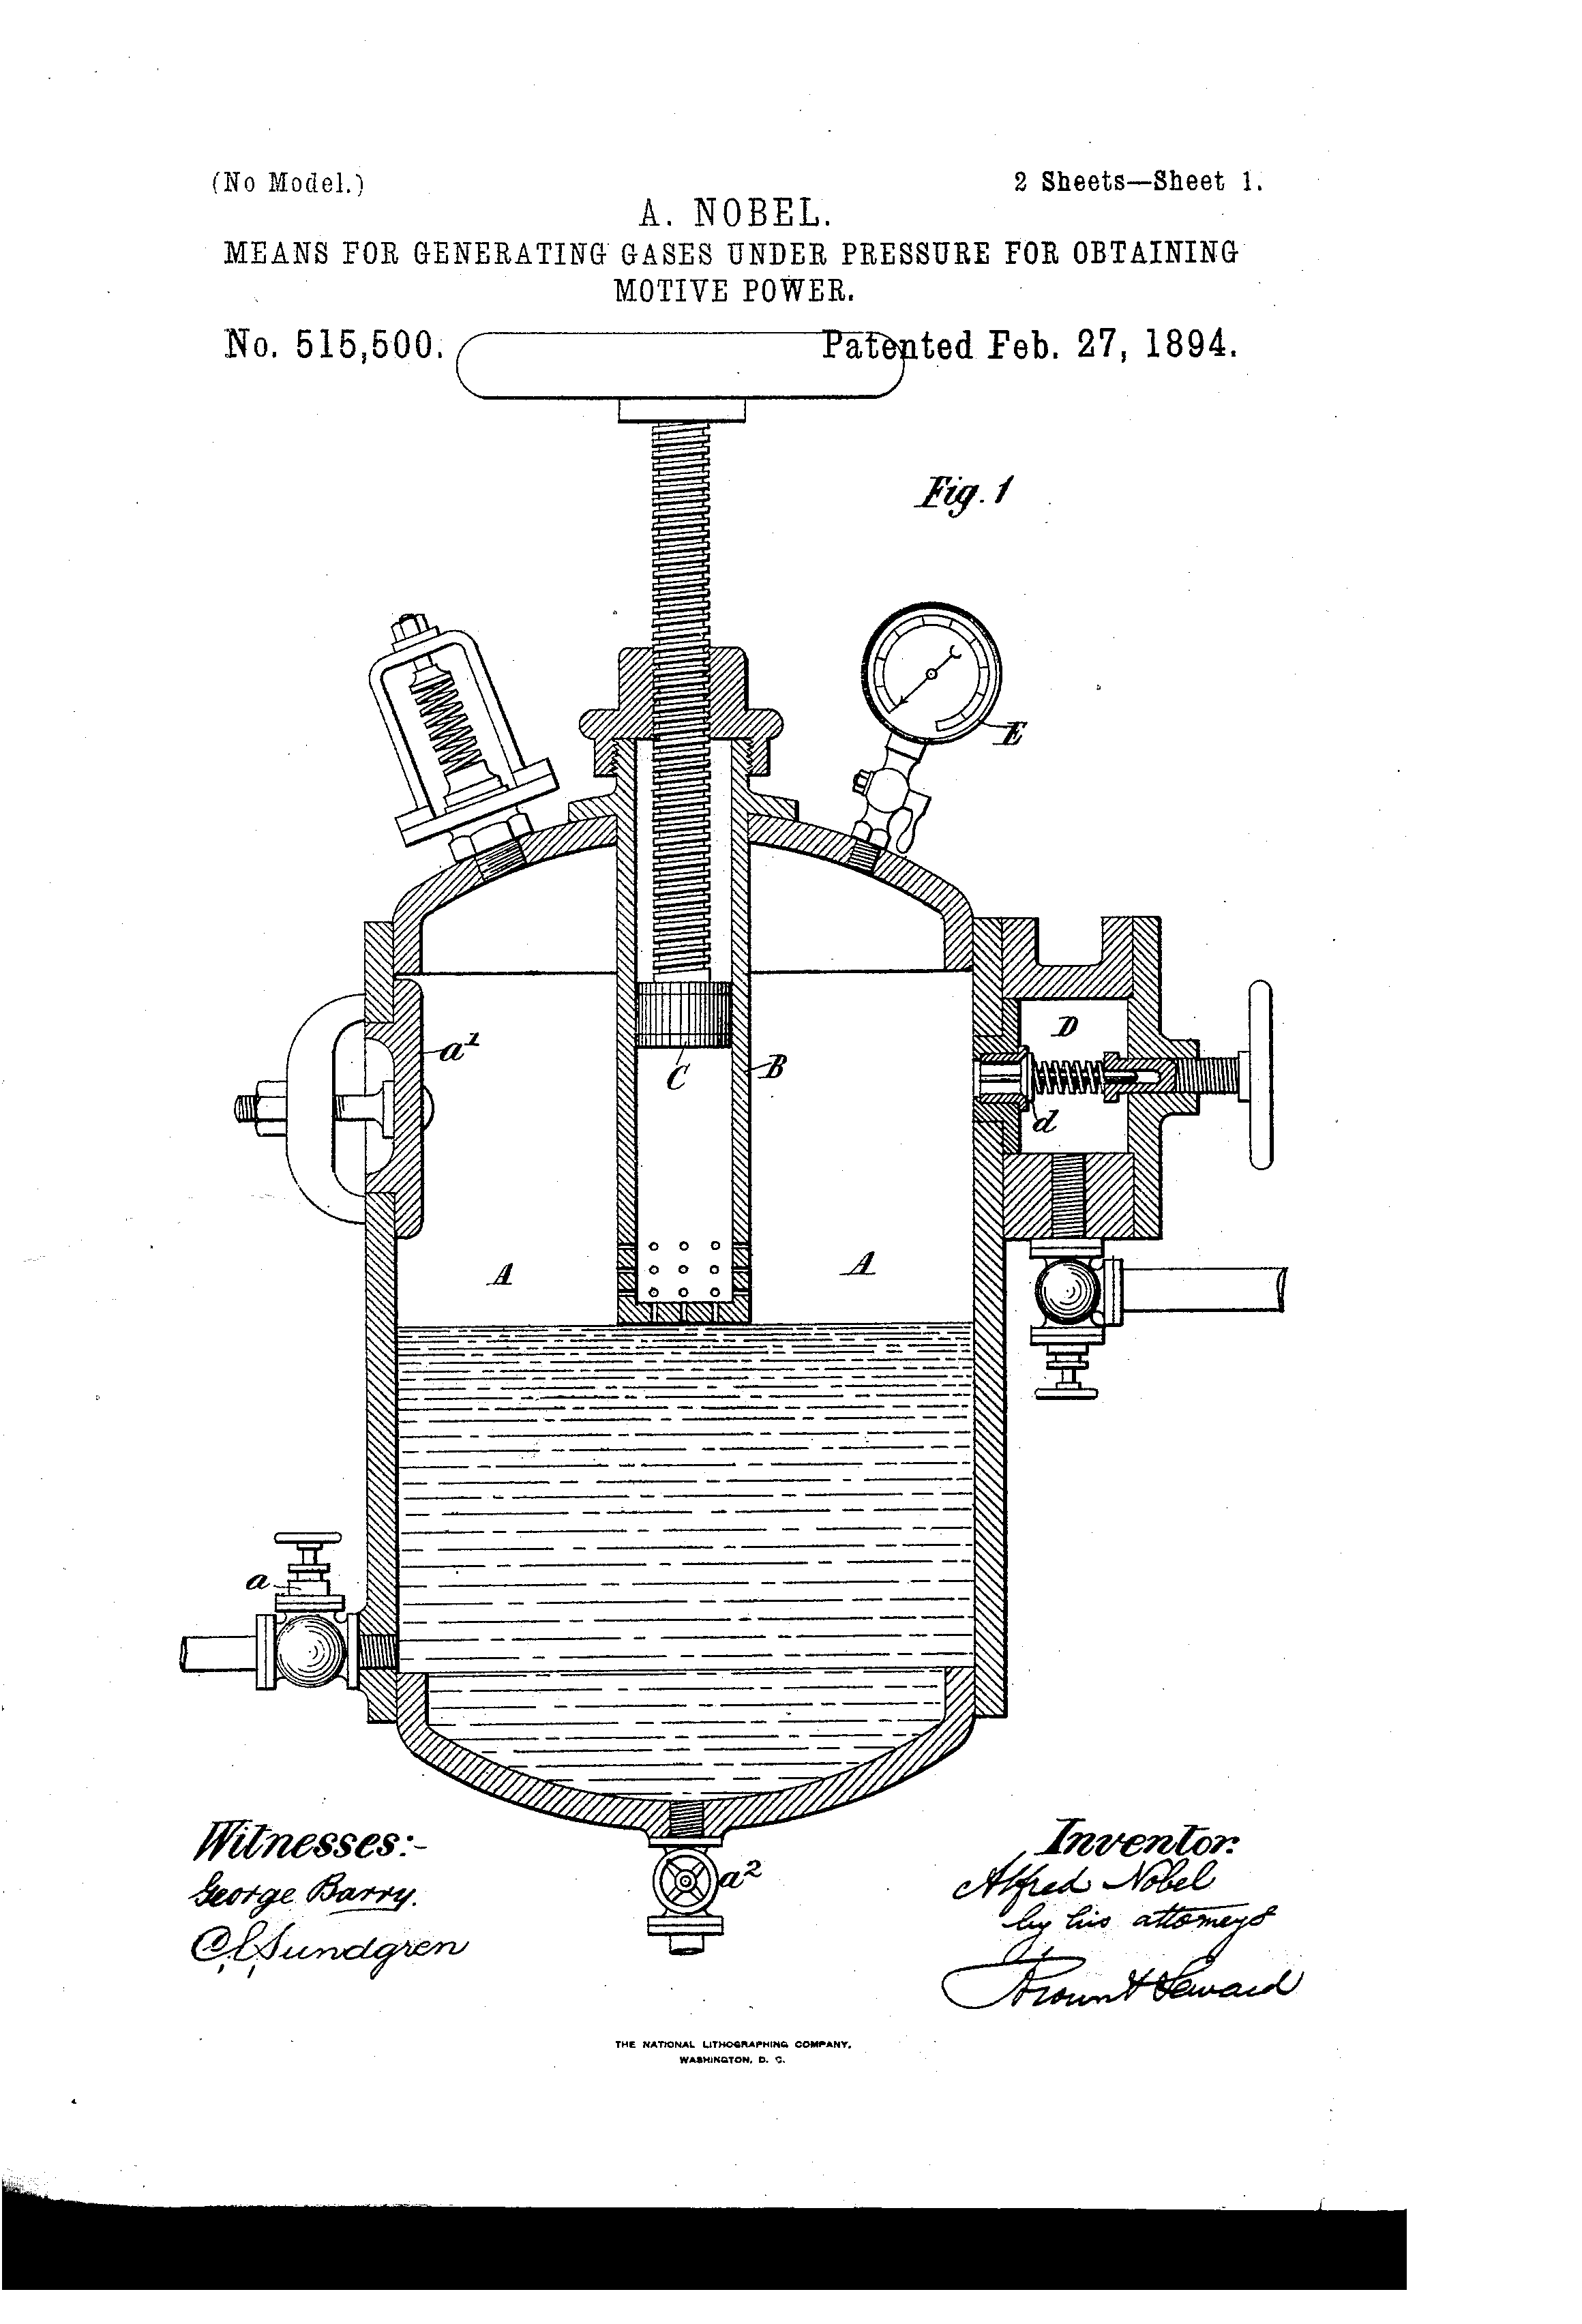 Patent US515500 - Alfred nobel - Google Patents